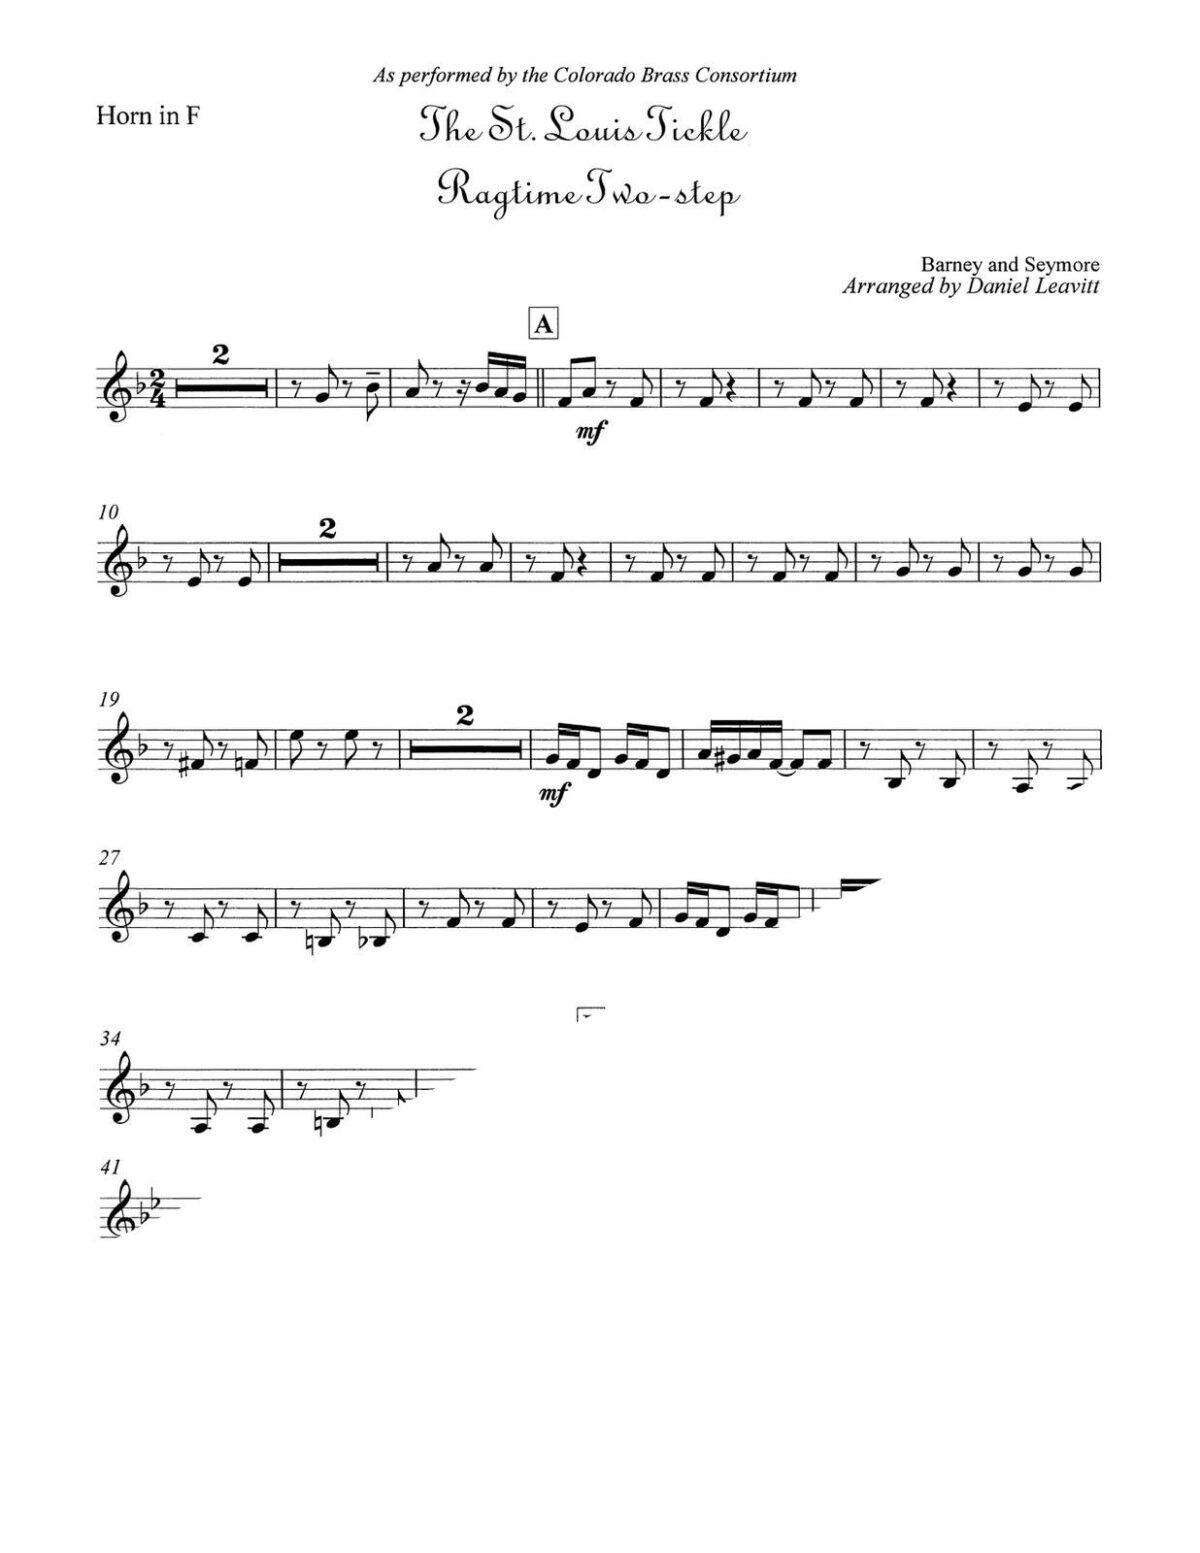 Seymore arr. Leavitt, The St. Louis Tickle Ragtime Two-Step brass quintet-p07